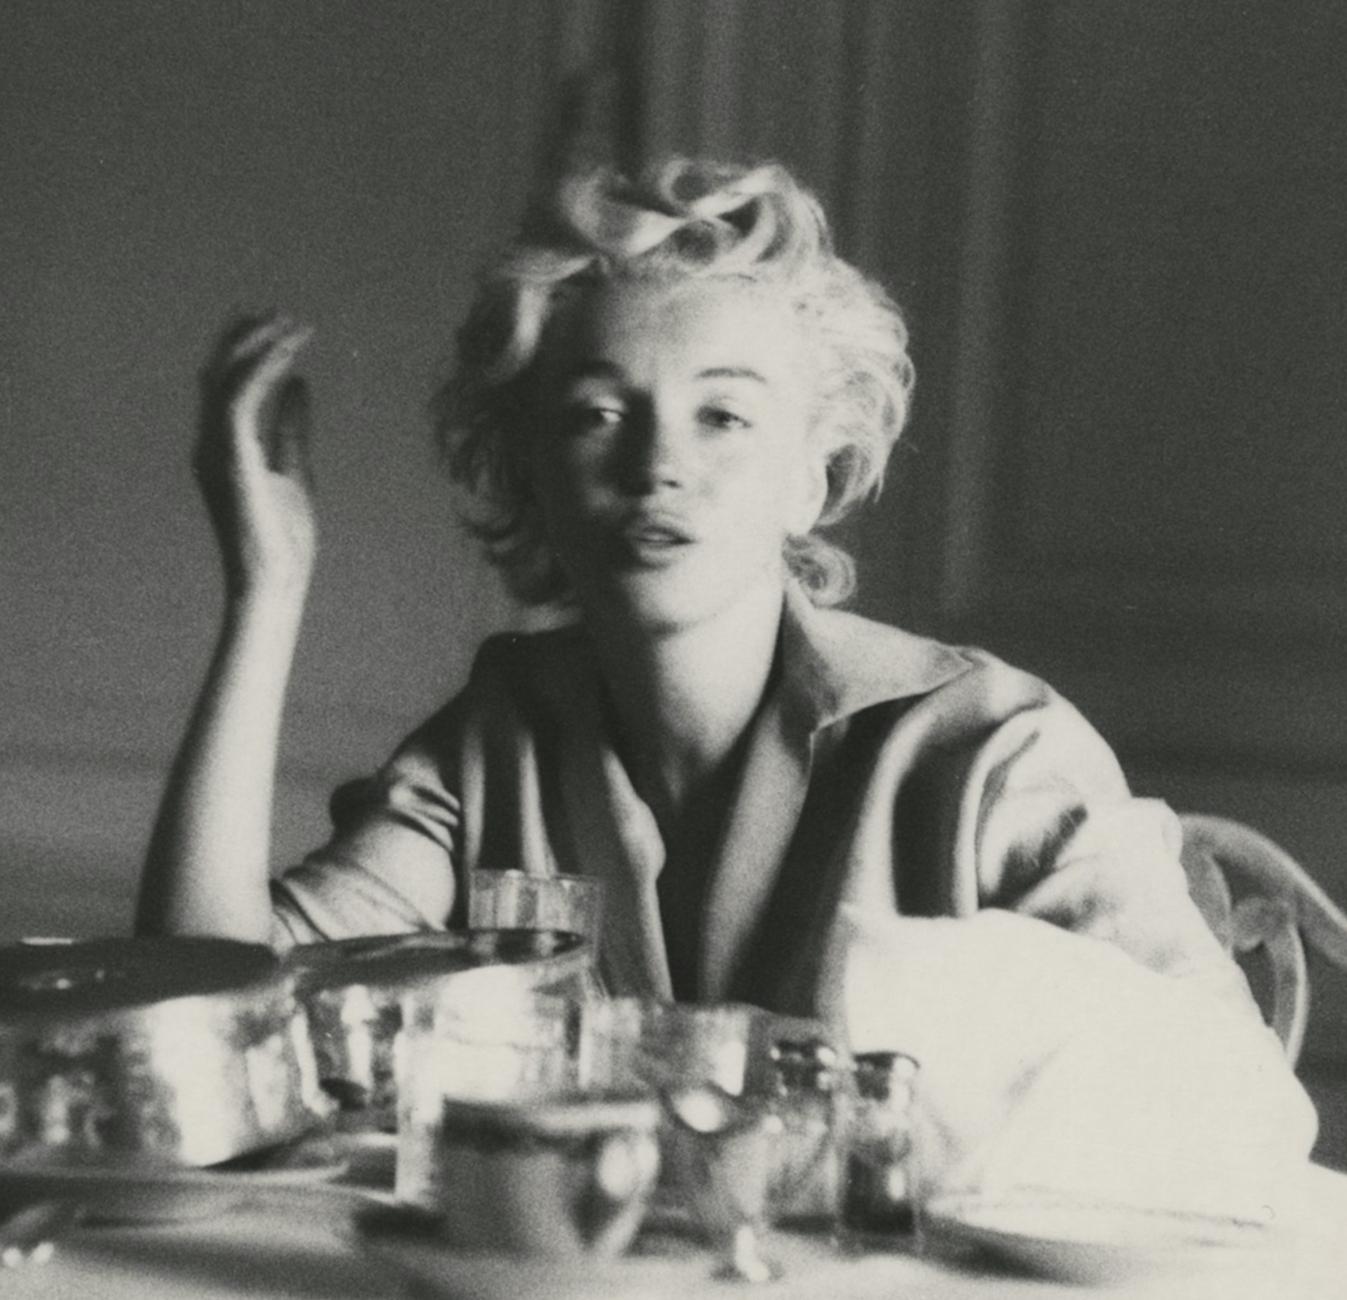 Classic Hollywood #50 - Marilyn Monroe Sans Makeup